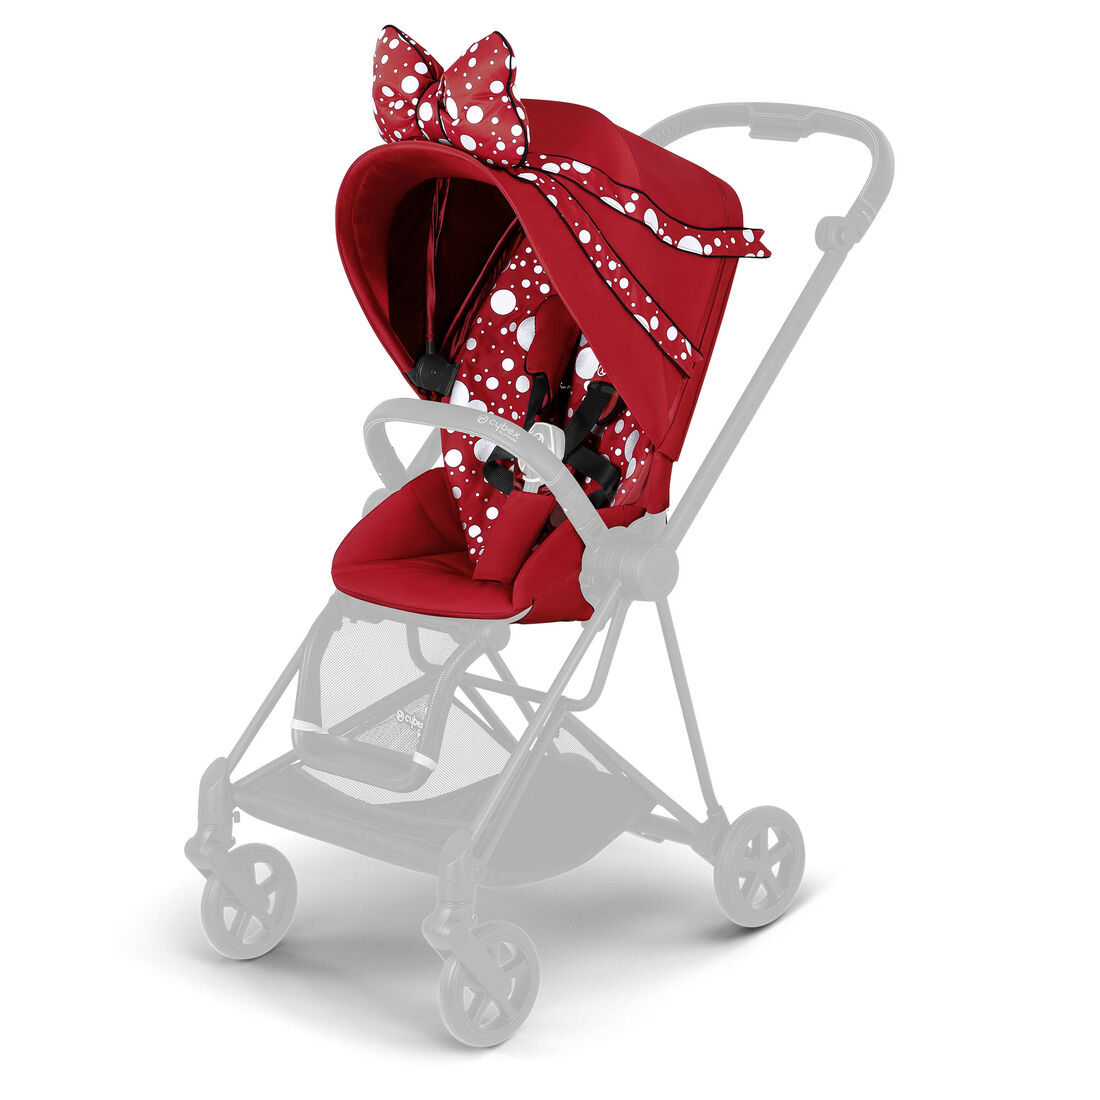 CYBEX Mios Sitzpaket - Petticoat Red in Petticoat Red large Bild 1